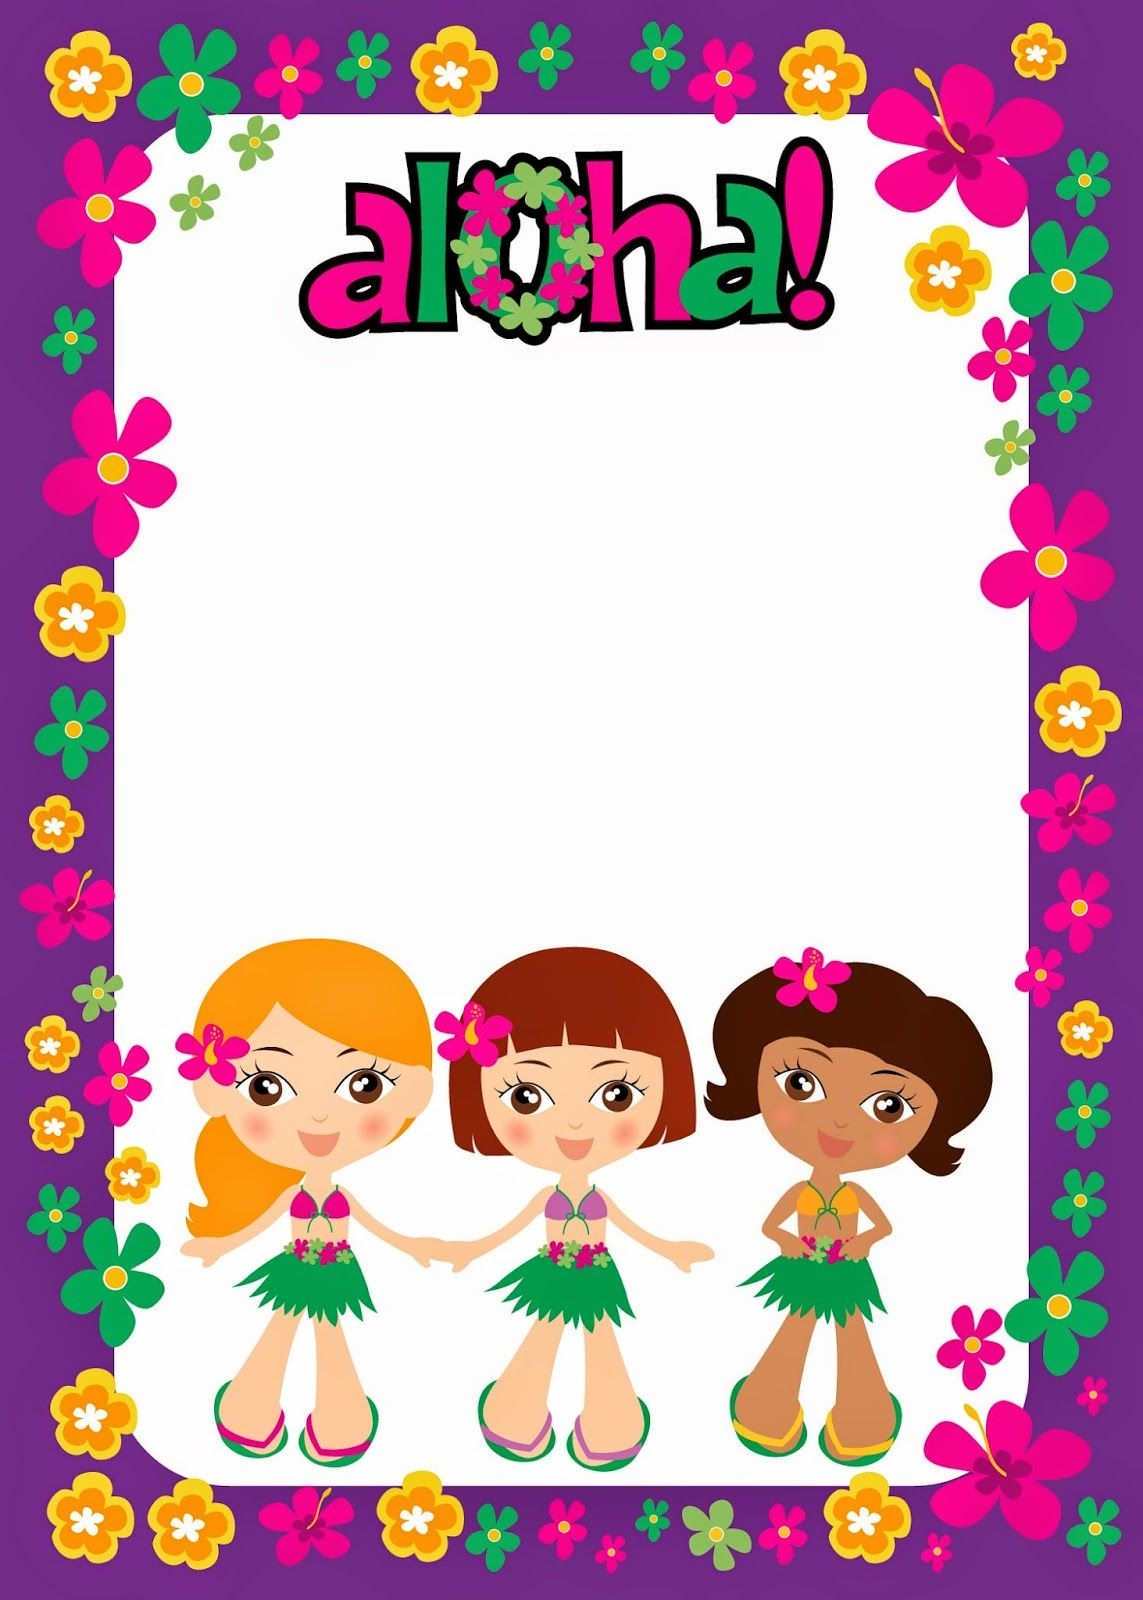 Free Printable Kids Luau Party Kit 001 Jpg 1143 1600 Kids Luau Parties Kids Luau Party Kit